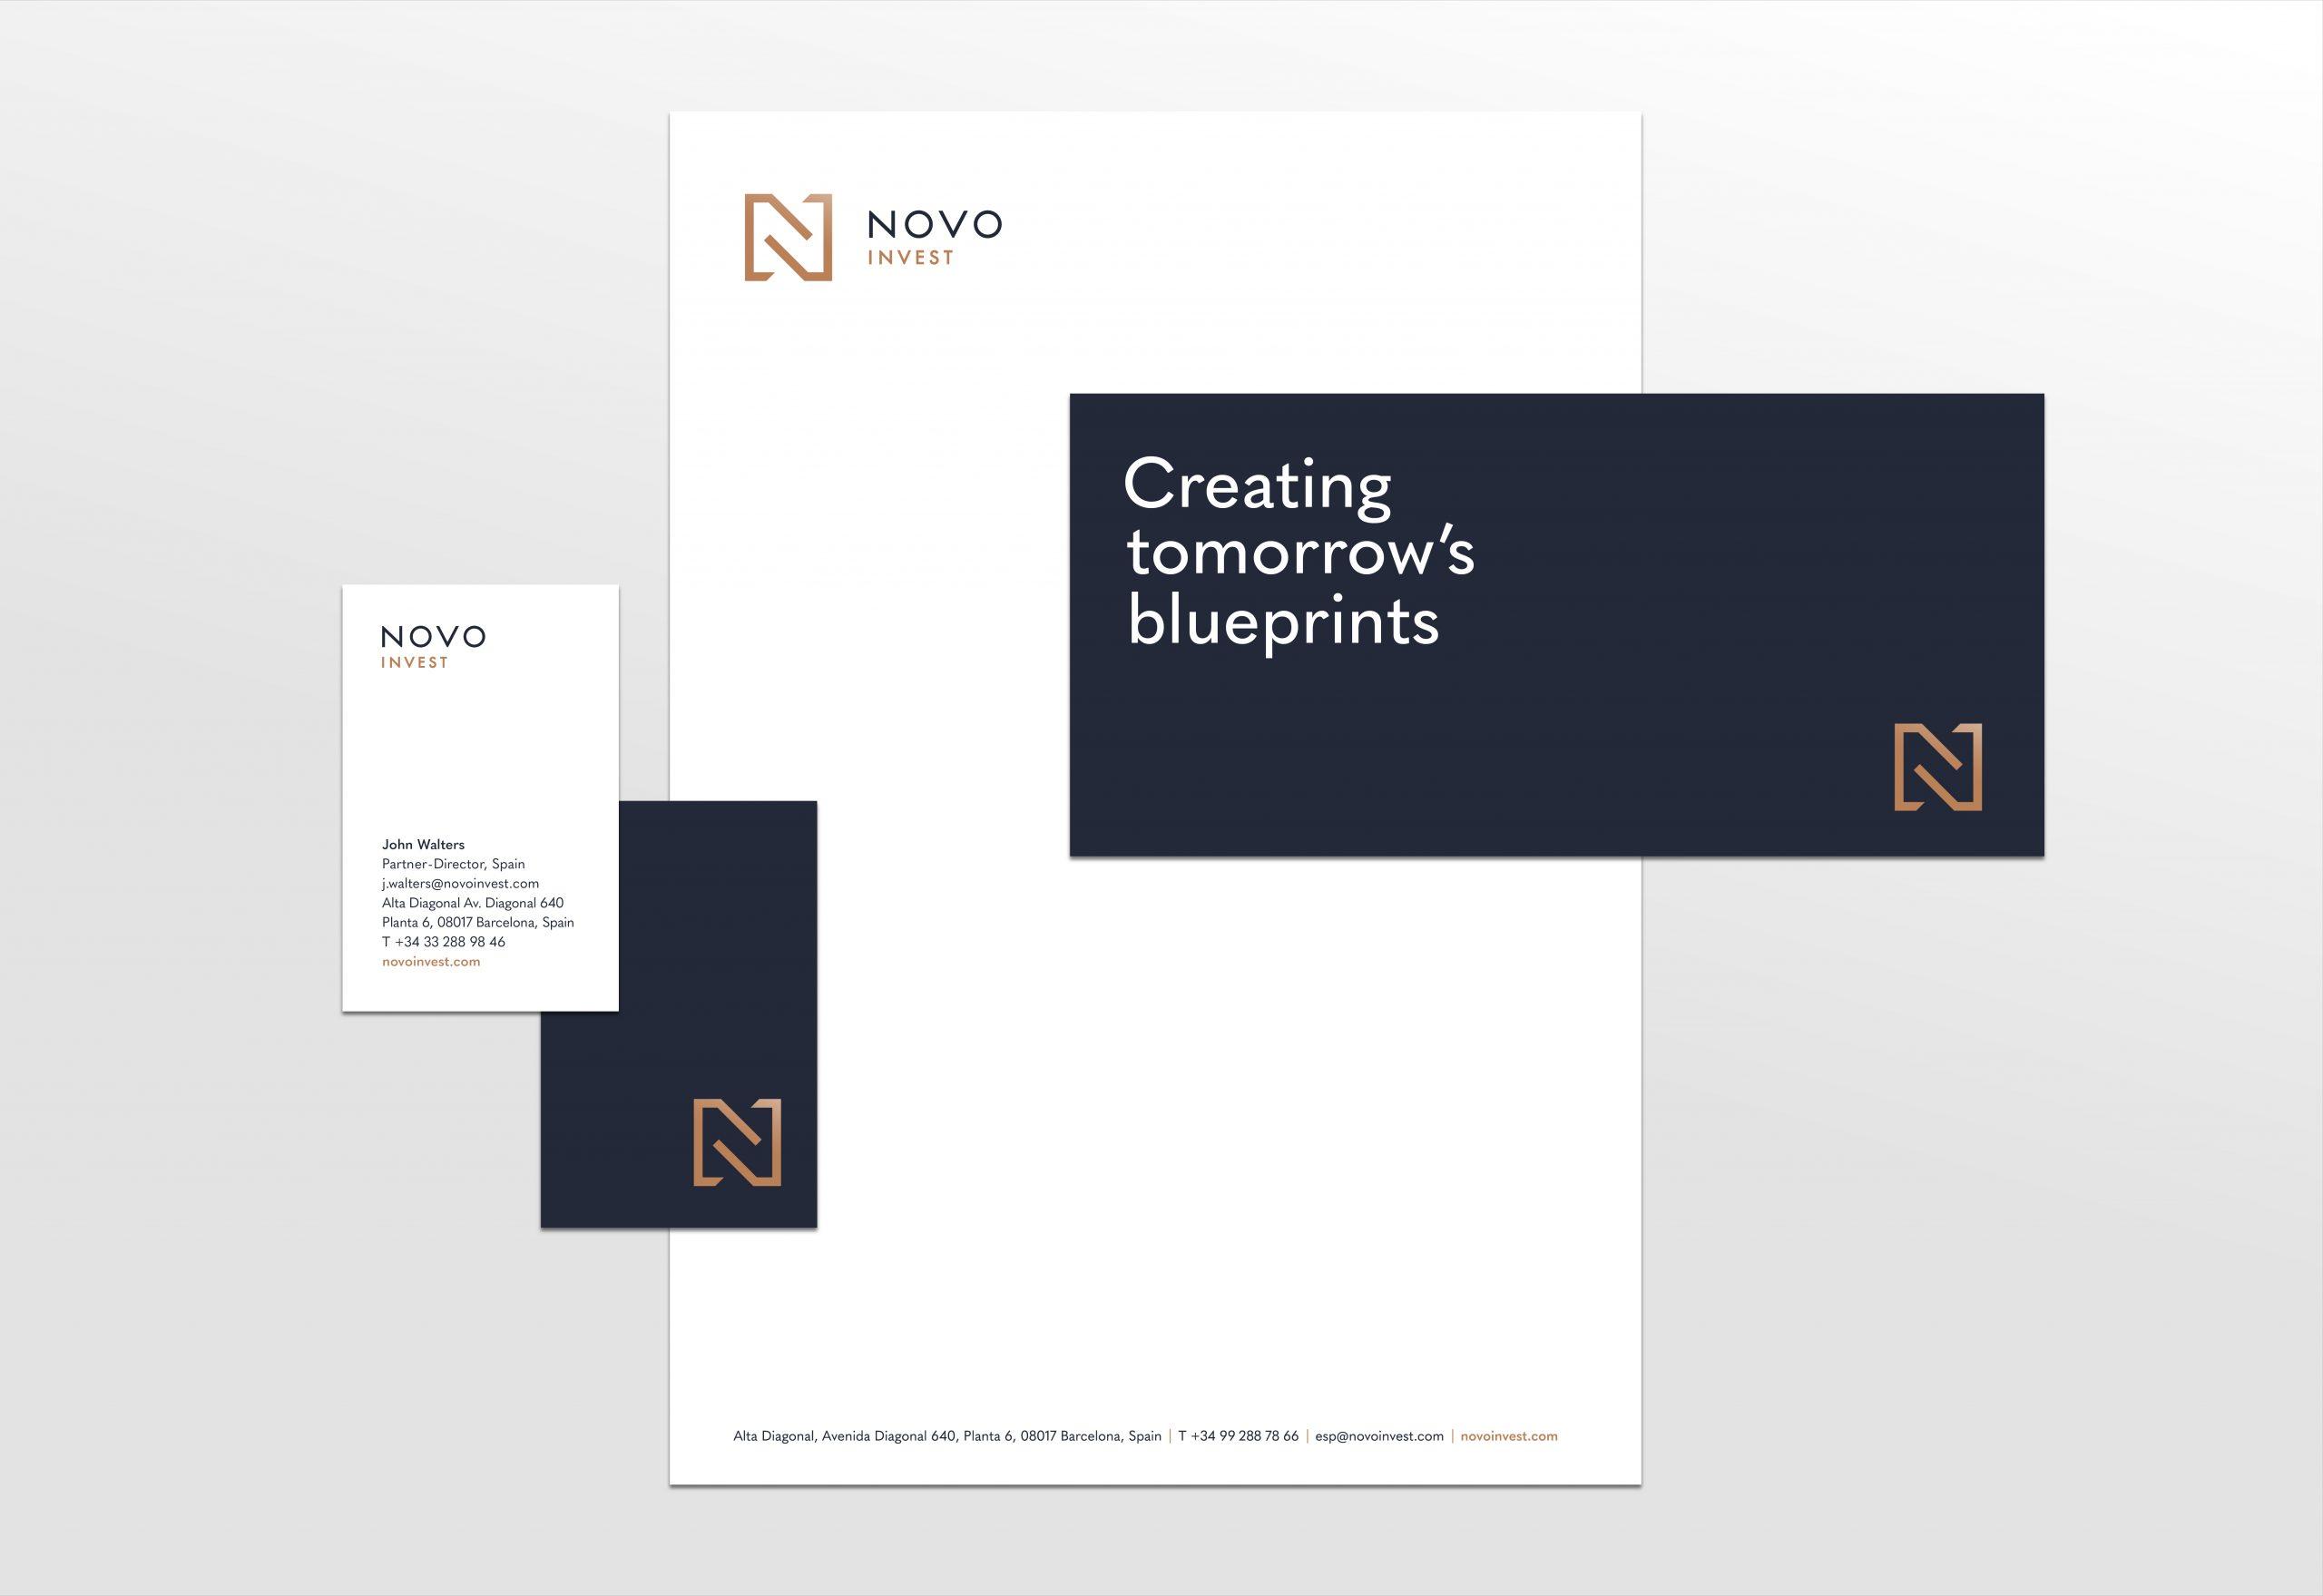 Novo Invest Corporate Identity Design